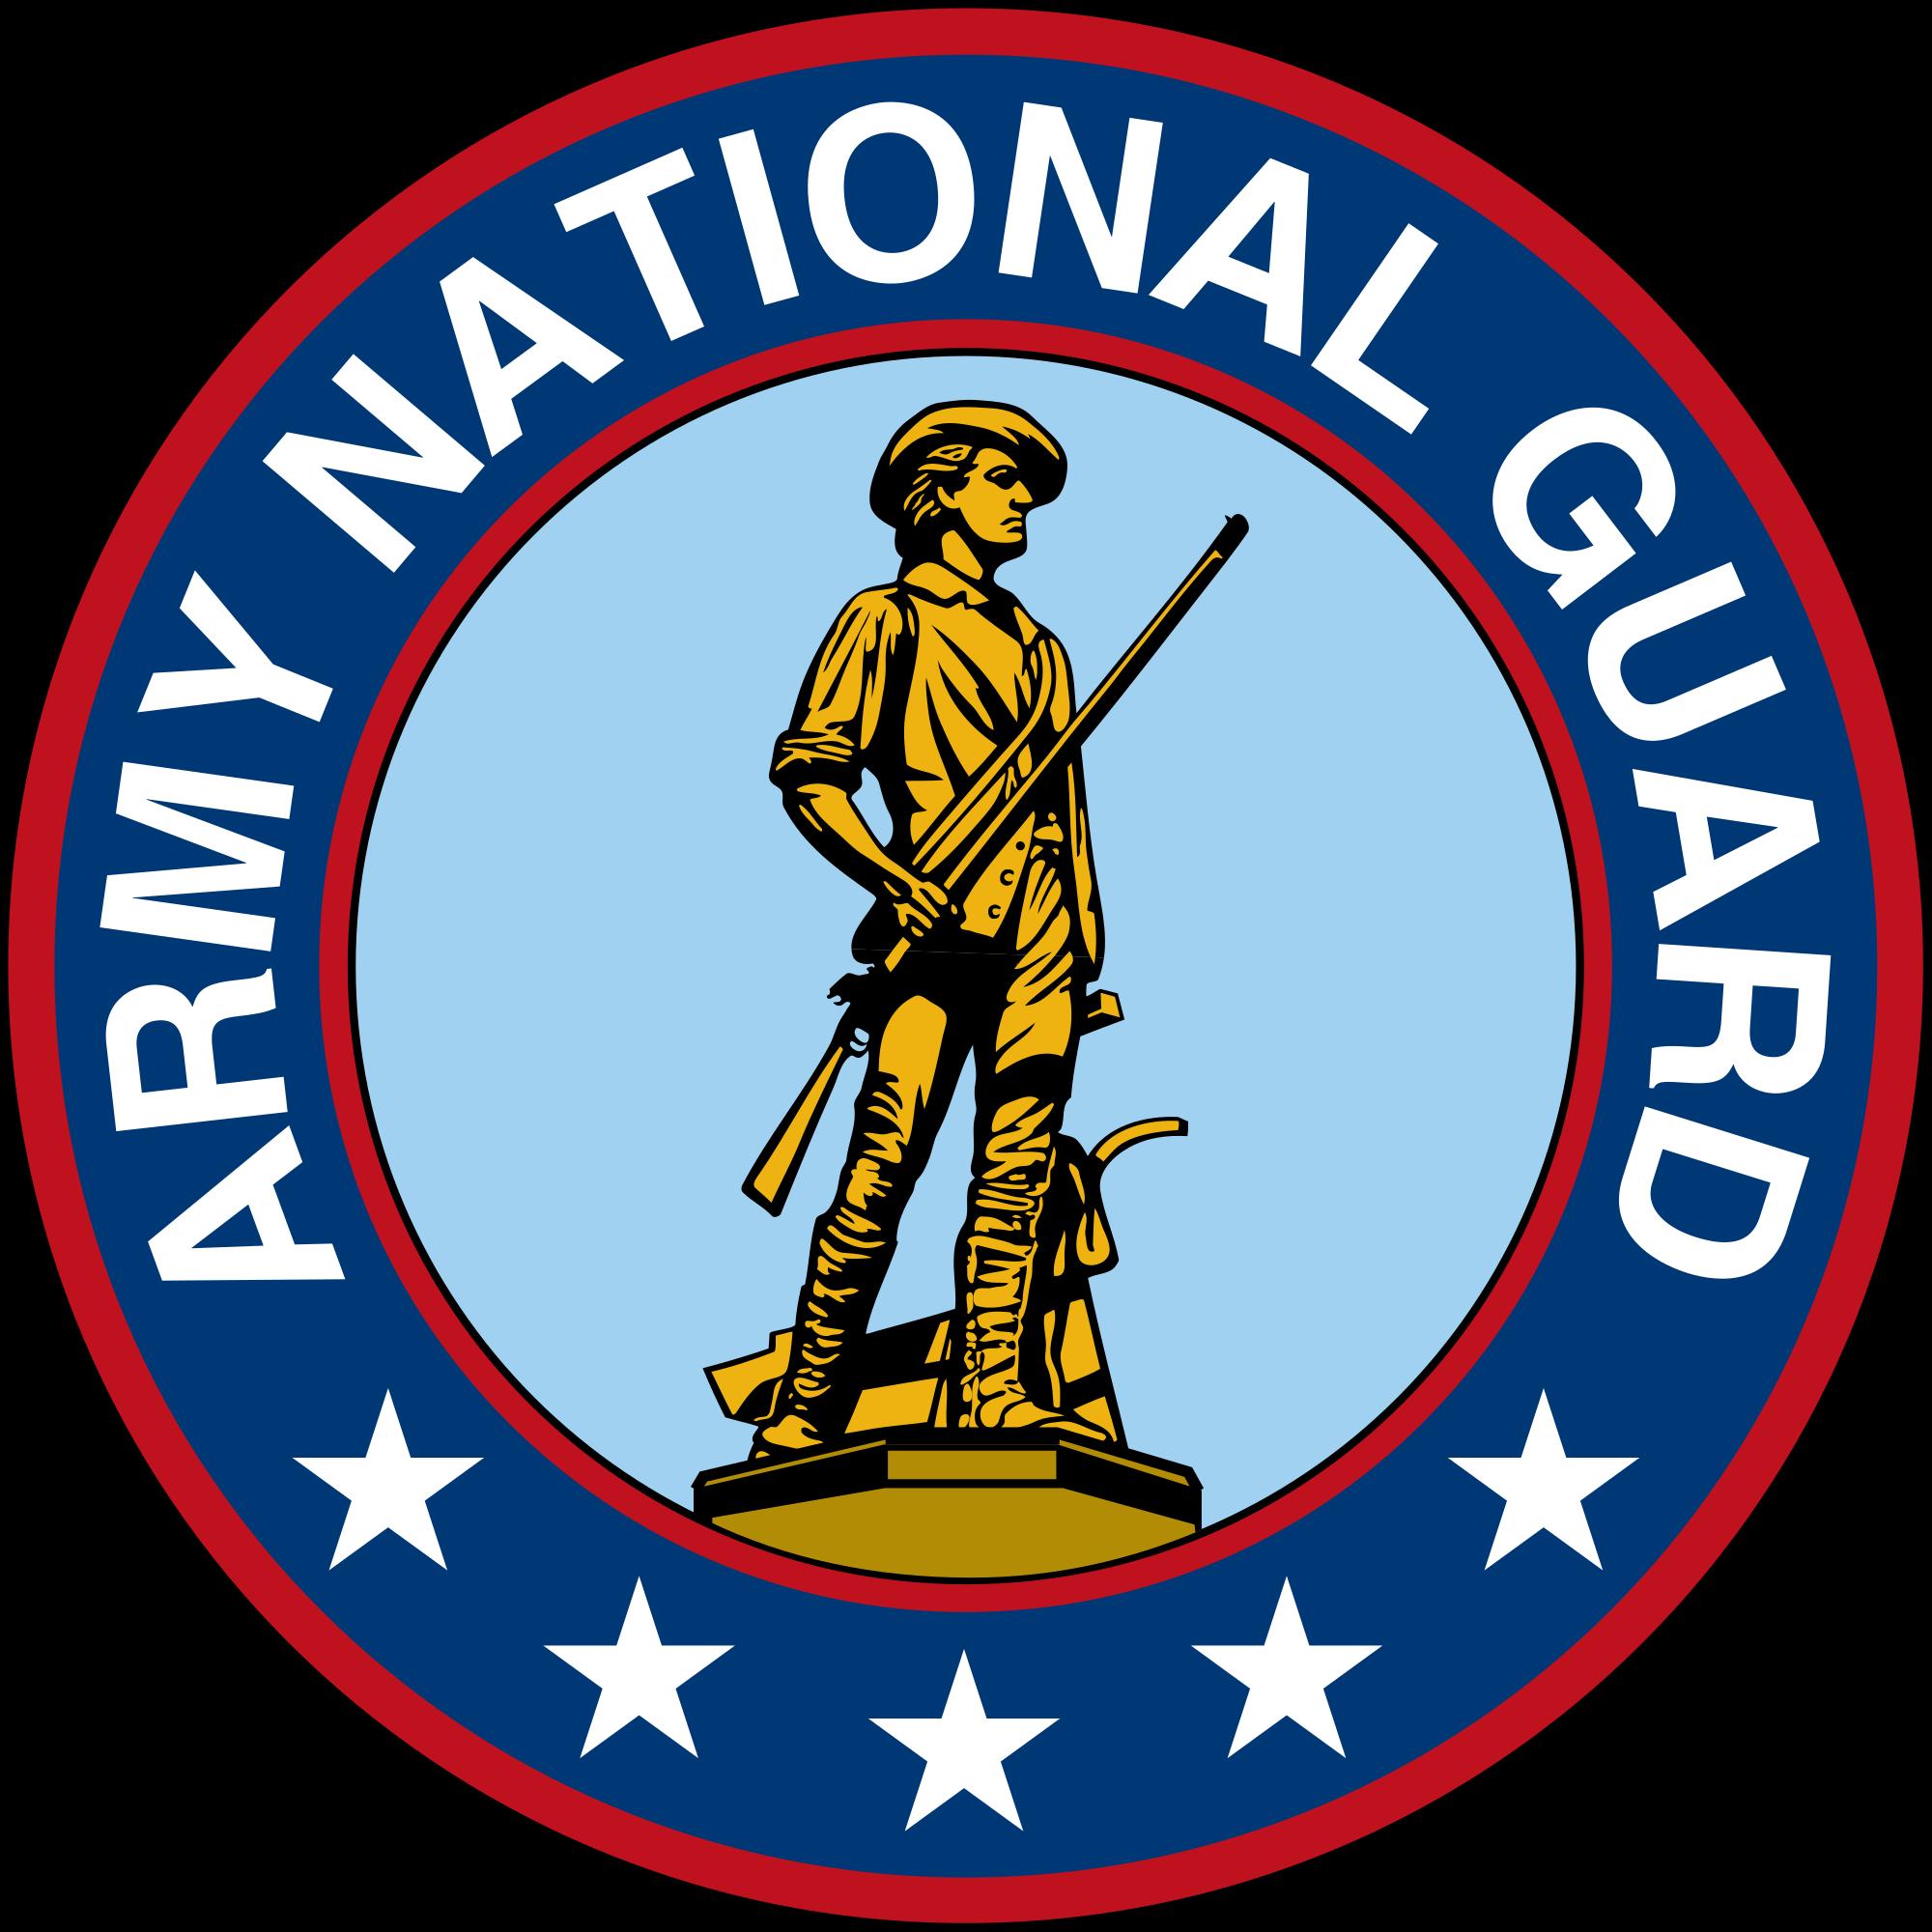 ArmyNationalGuard